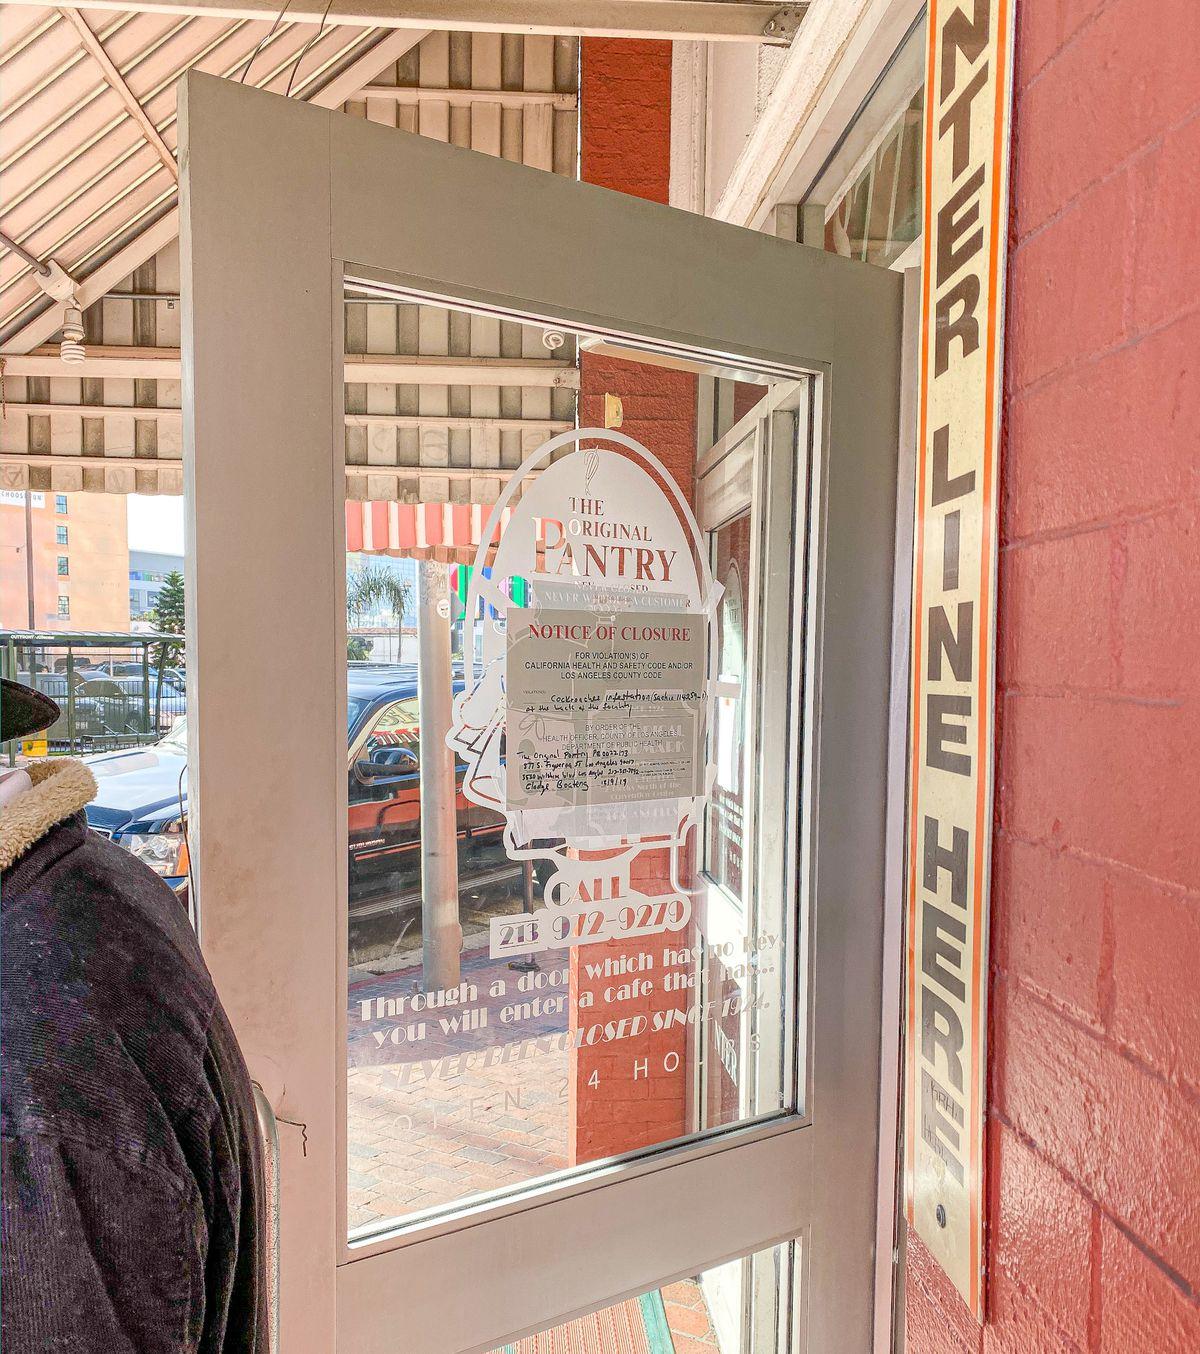 A health department closure notice is tucked away on a door.